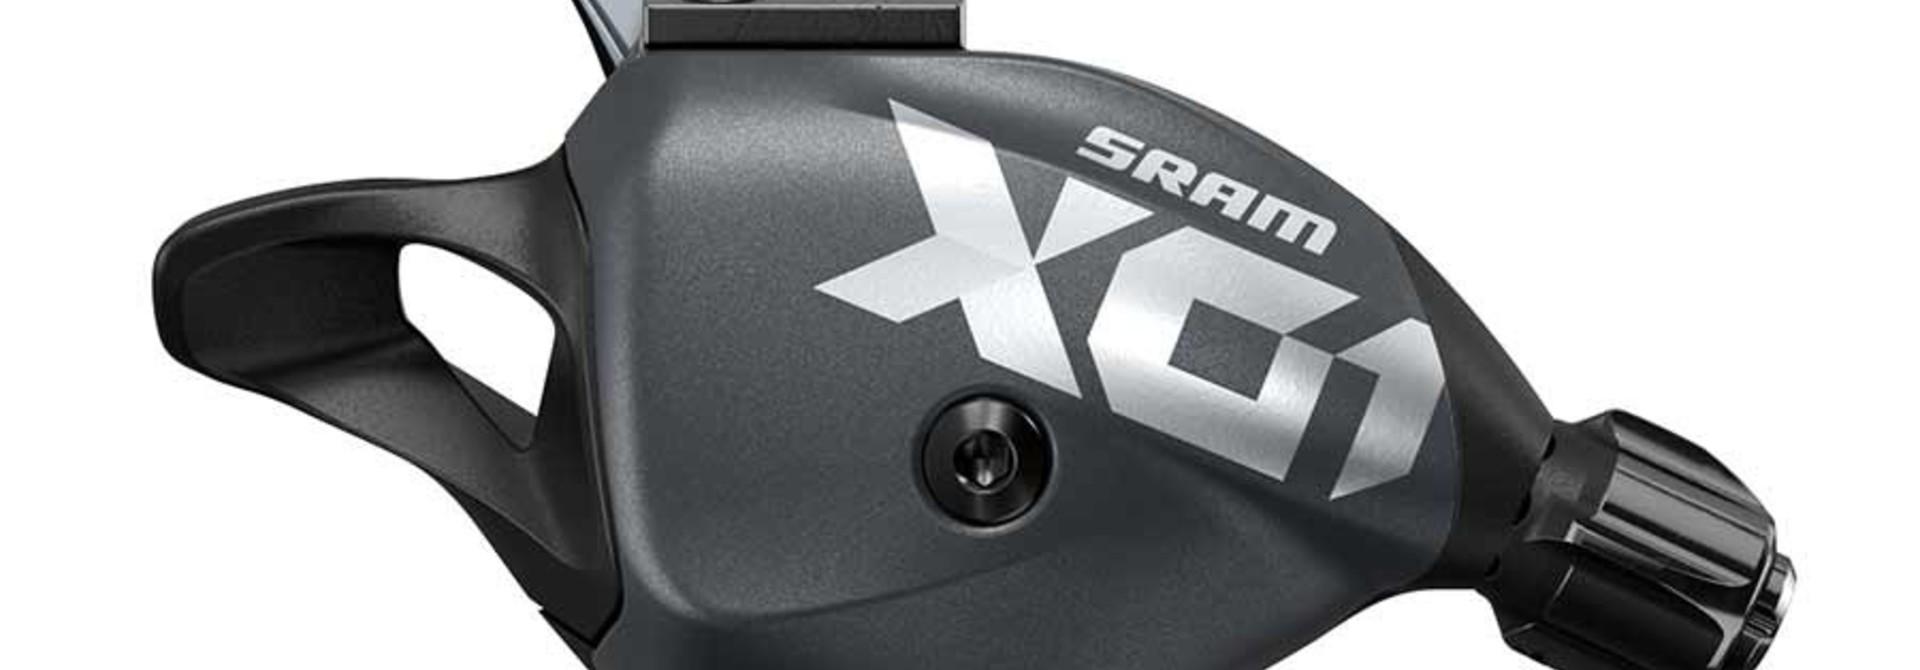 SRAM, X01 Eagle, Trigger Shifter, Speed: 12, Combination: MatchMaker X, Black